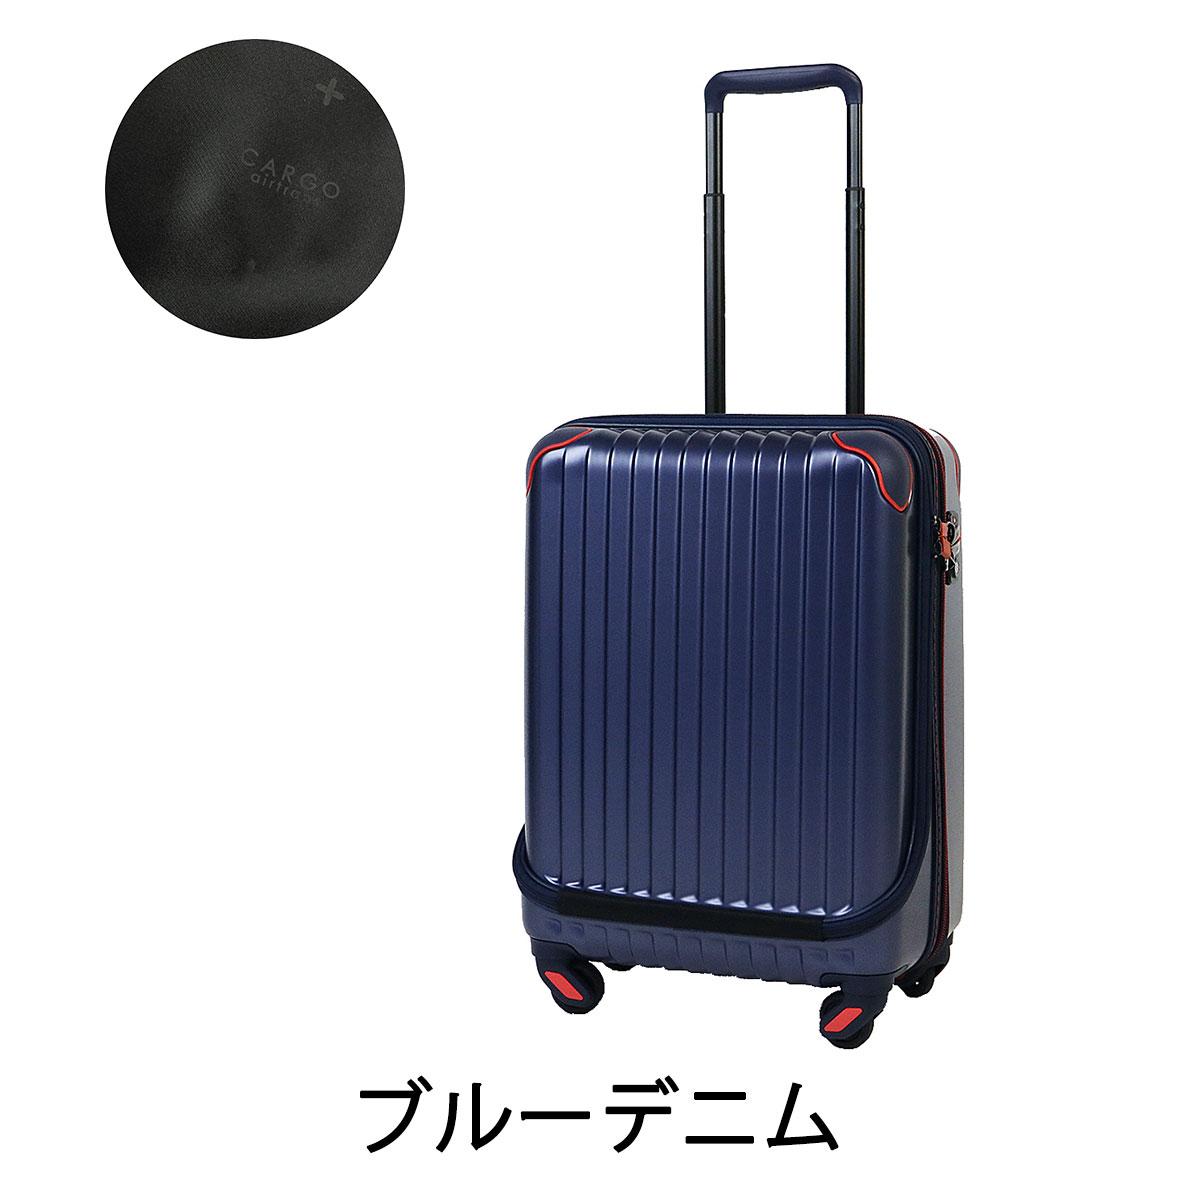 CARGO旅行箱airtrans货物空气穿过三个一组TRIO带上飞机飞翔距离情况35L S尺寸前台口袋商务出差1-2天CAT-423FP